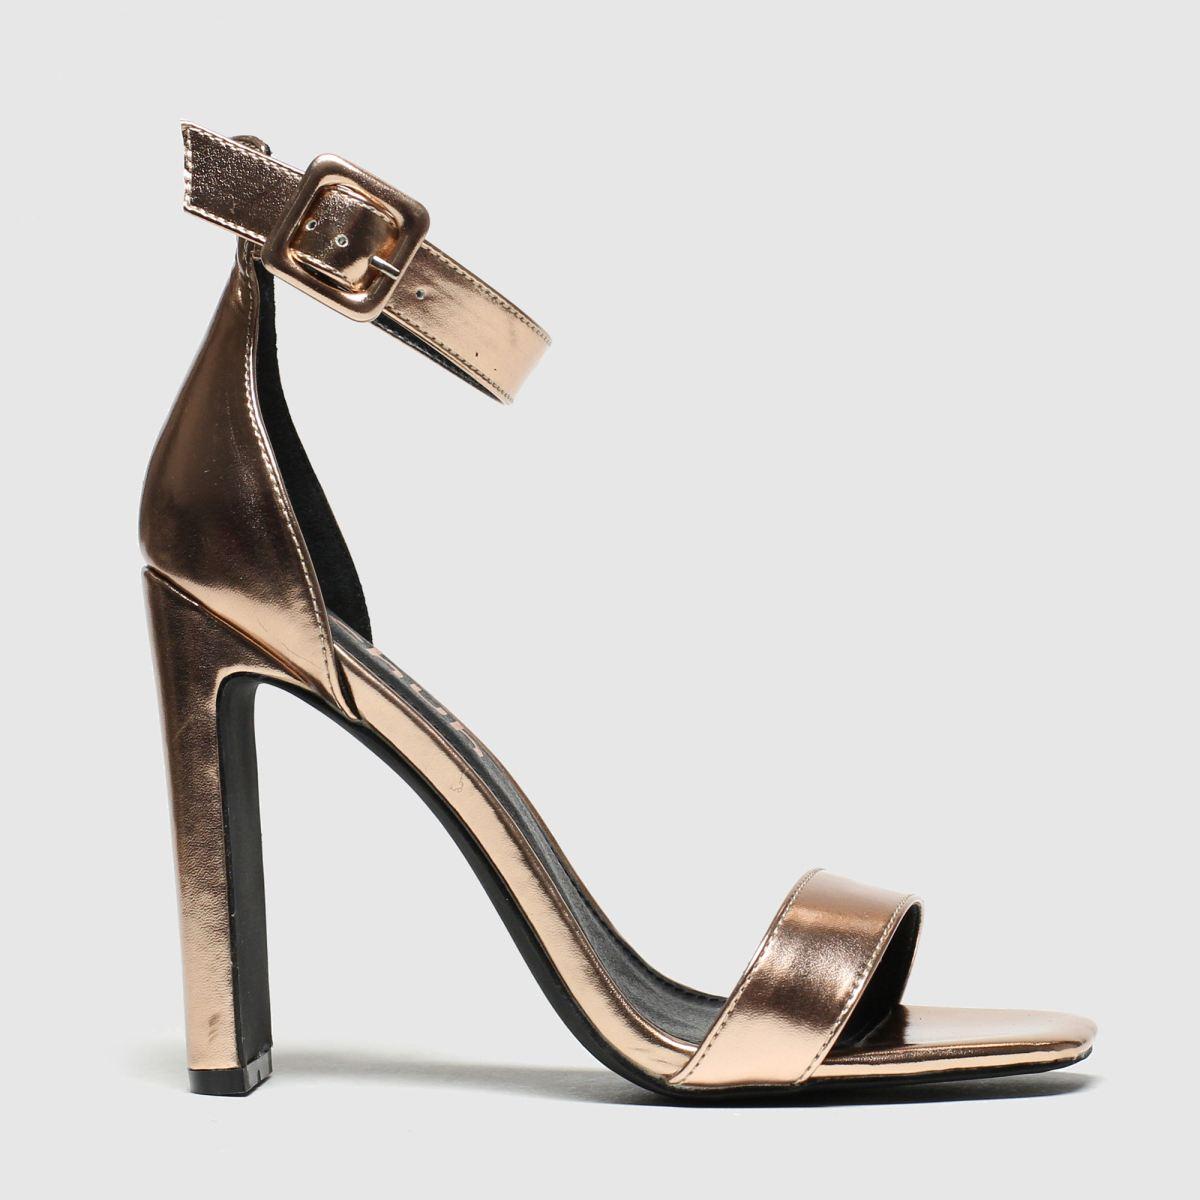 schuh Schuh Bronze Secret Crush High Heels